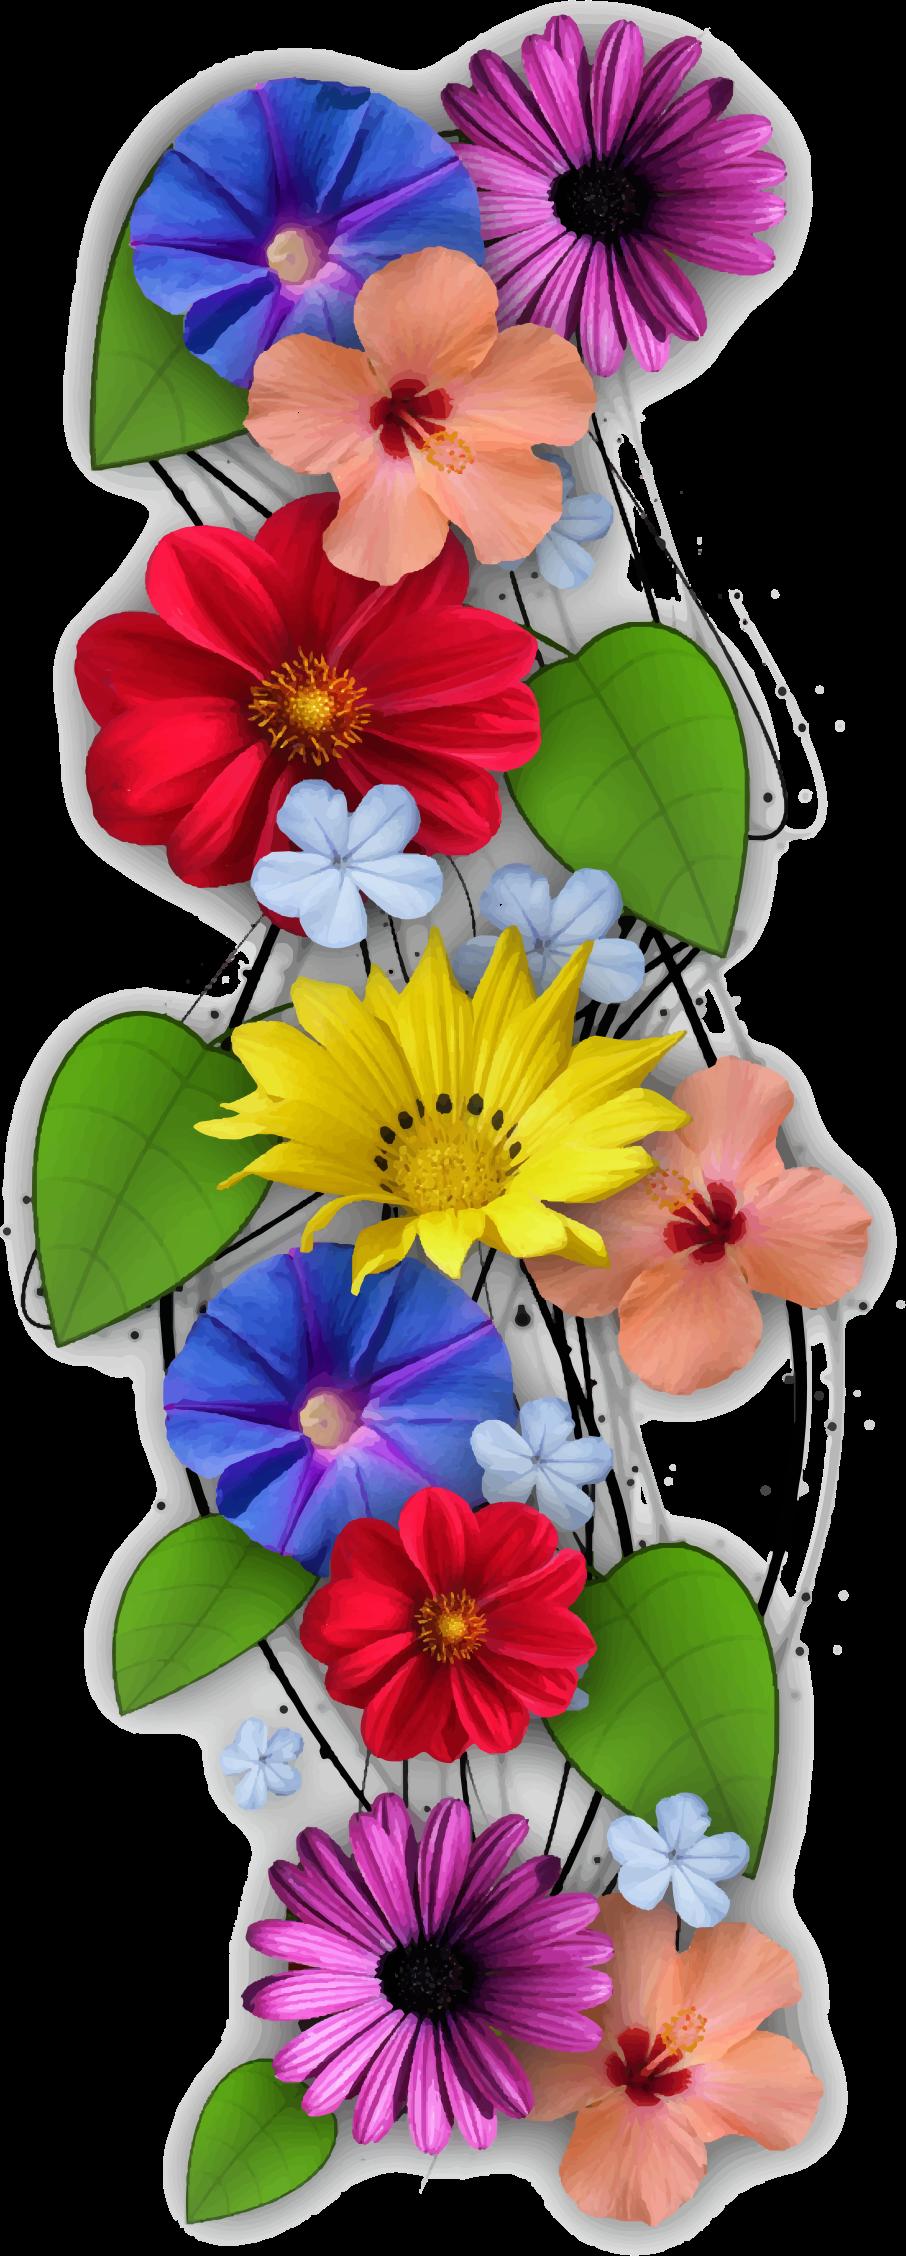 Vertical flowers. Clipart summer floral